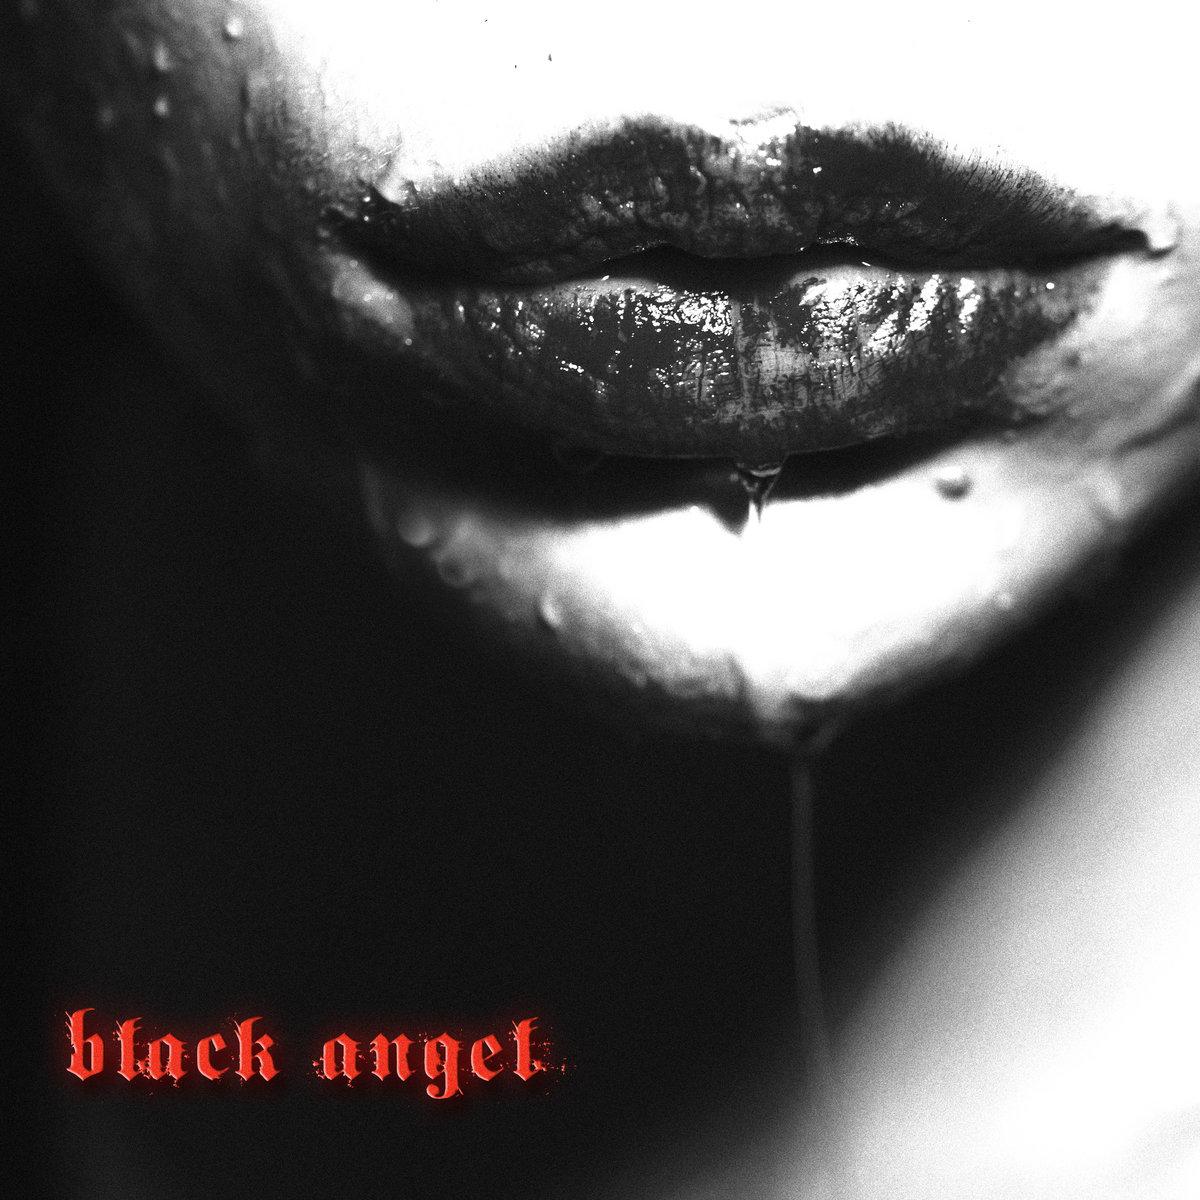 Brèves – The Gathering, Black Angel, Working Men's Club